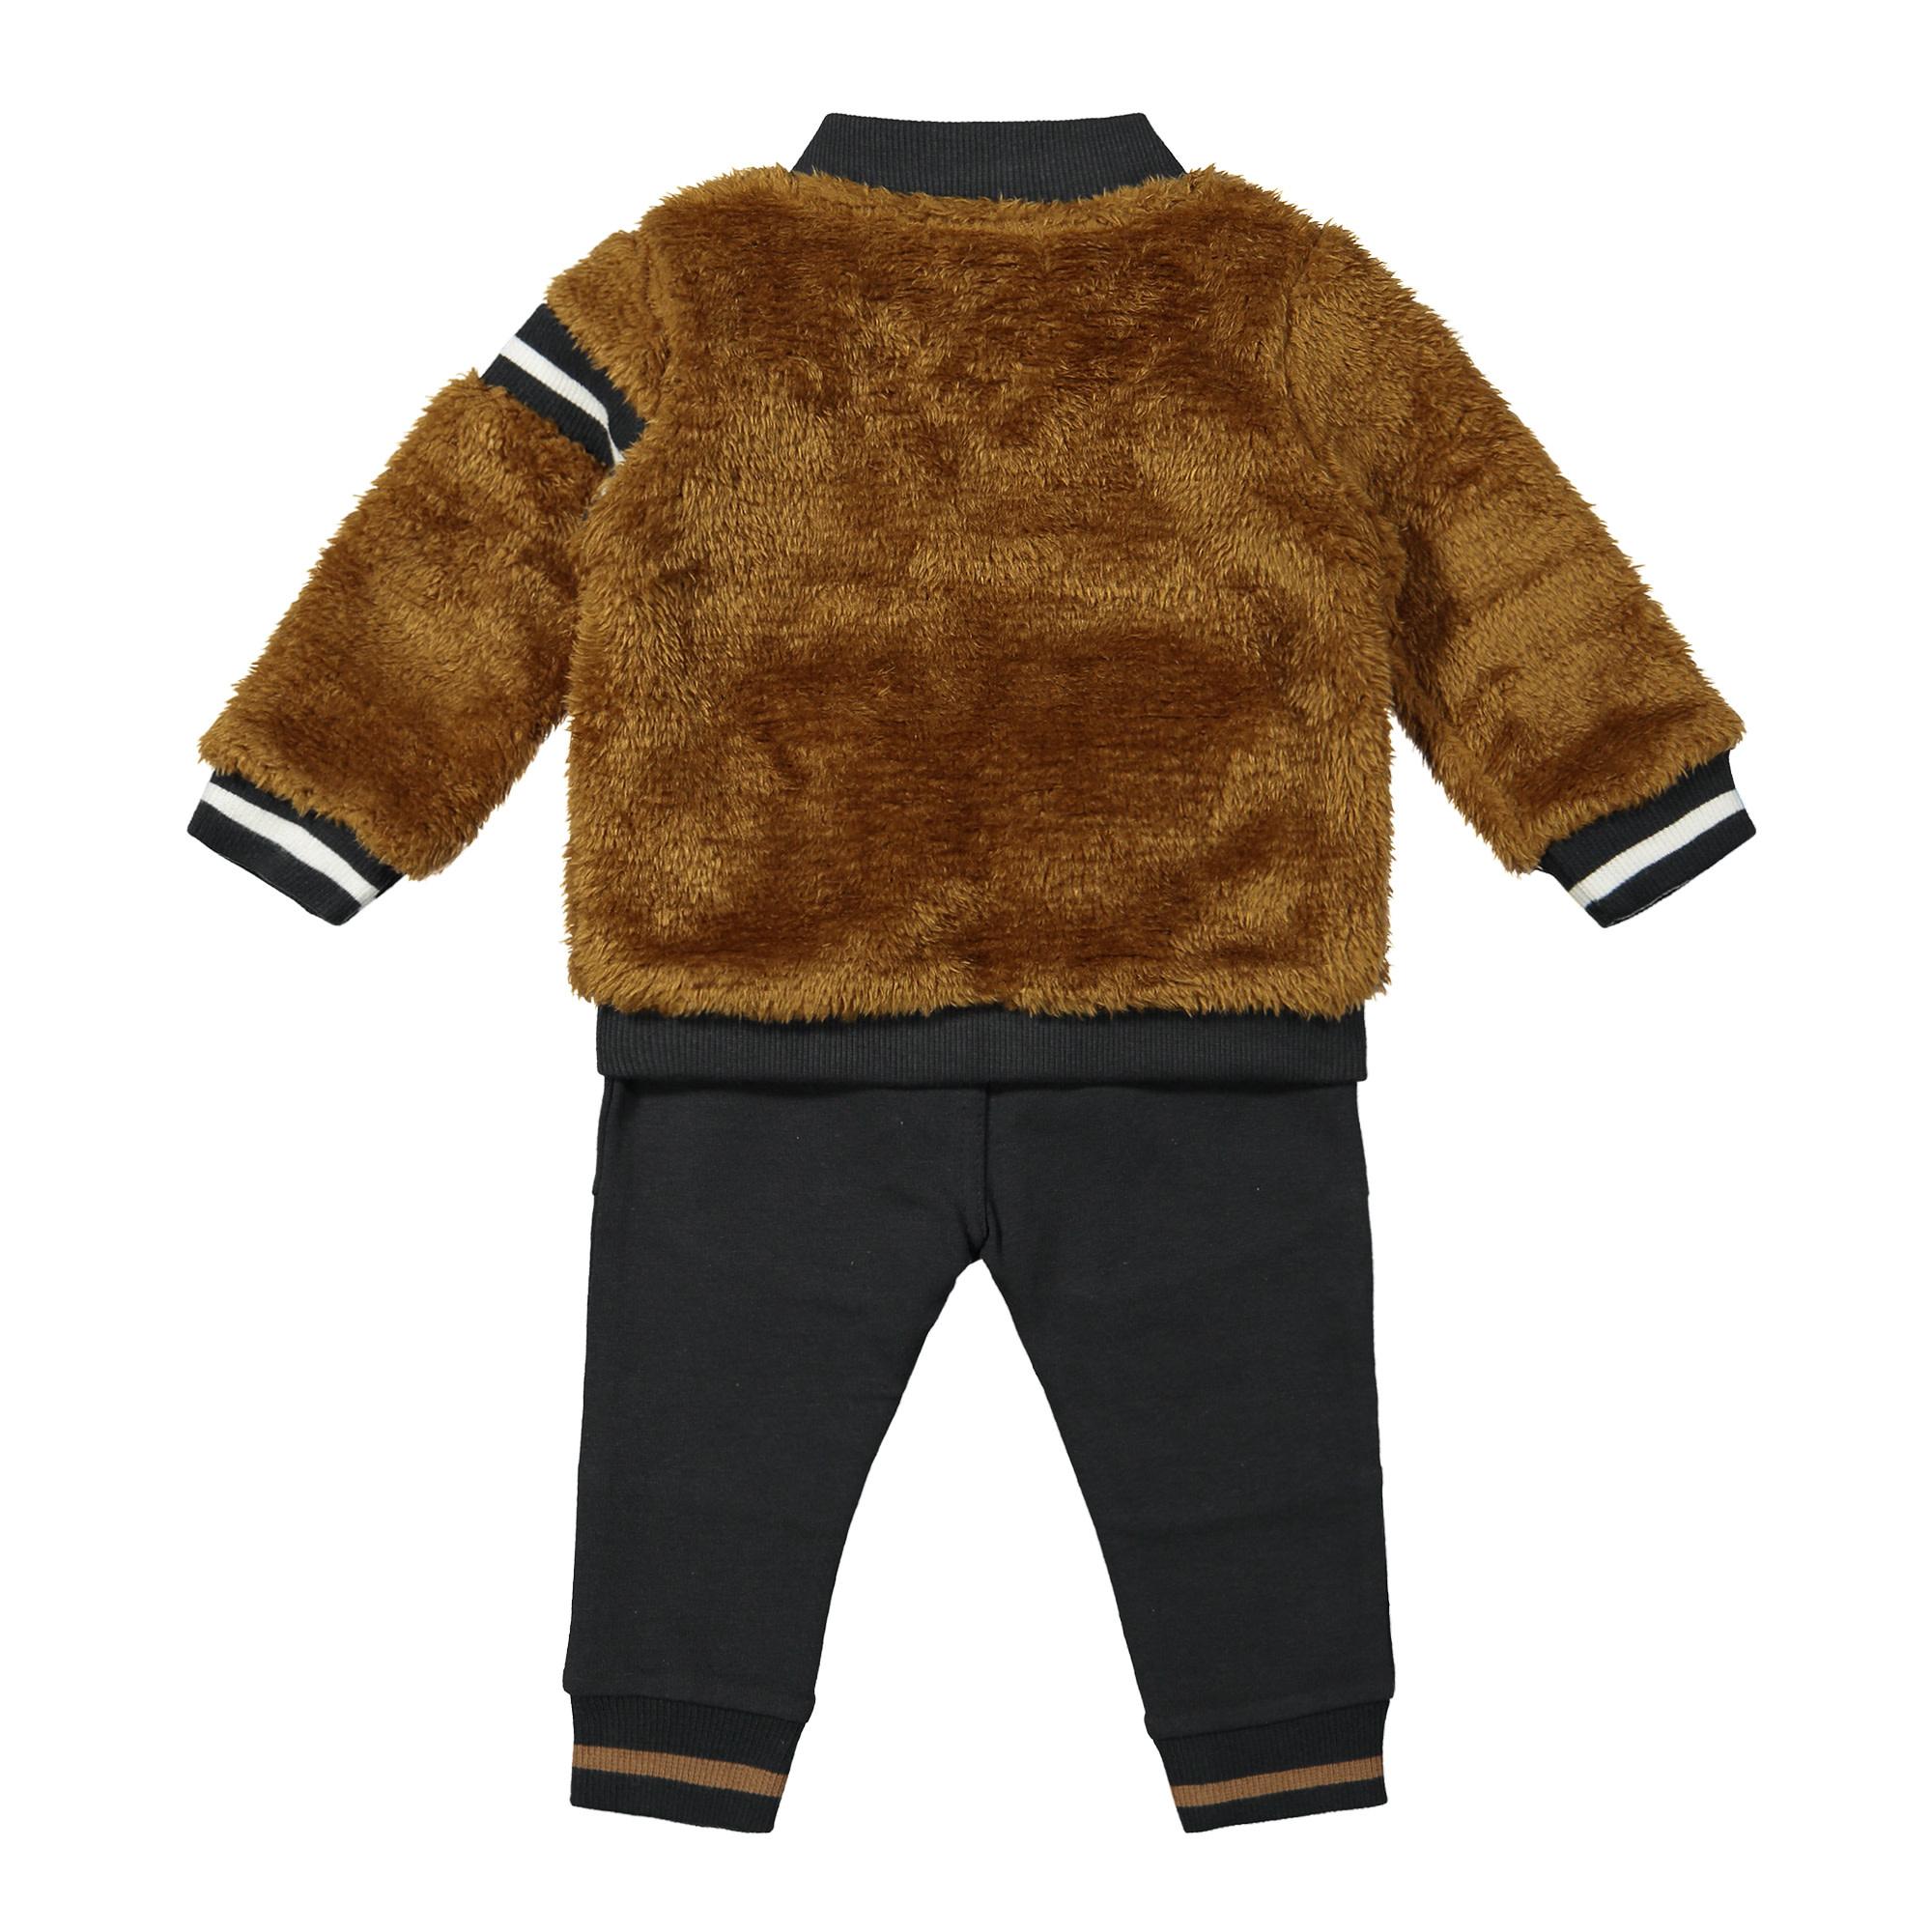 Teddy Coat 3 Piece Set